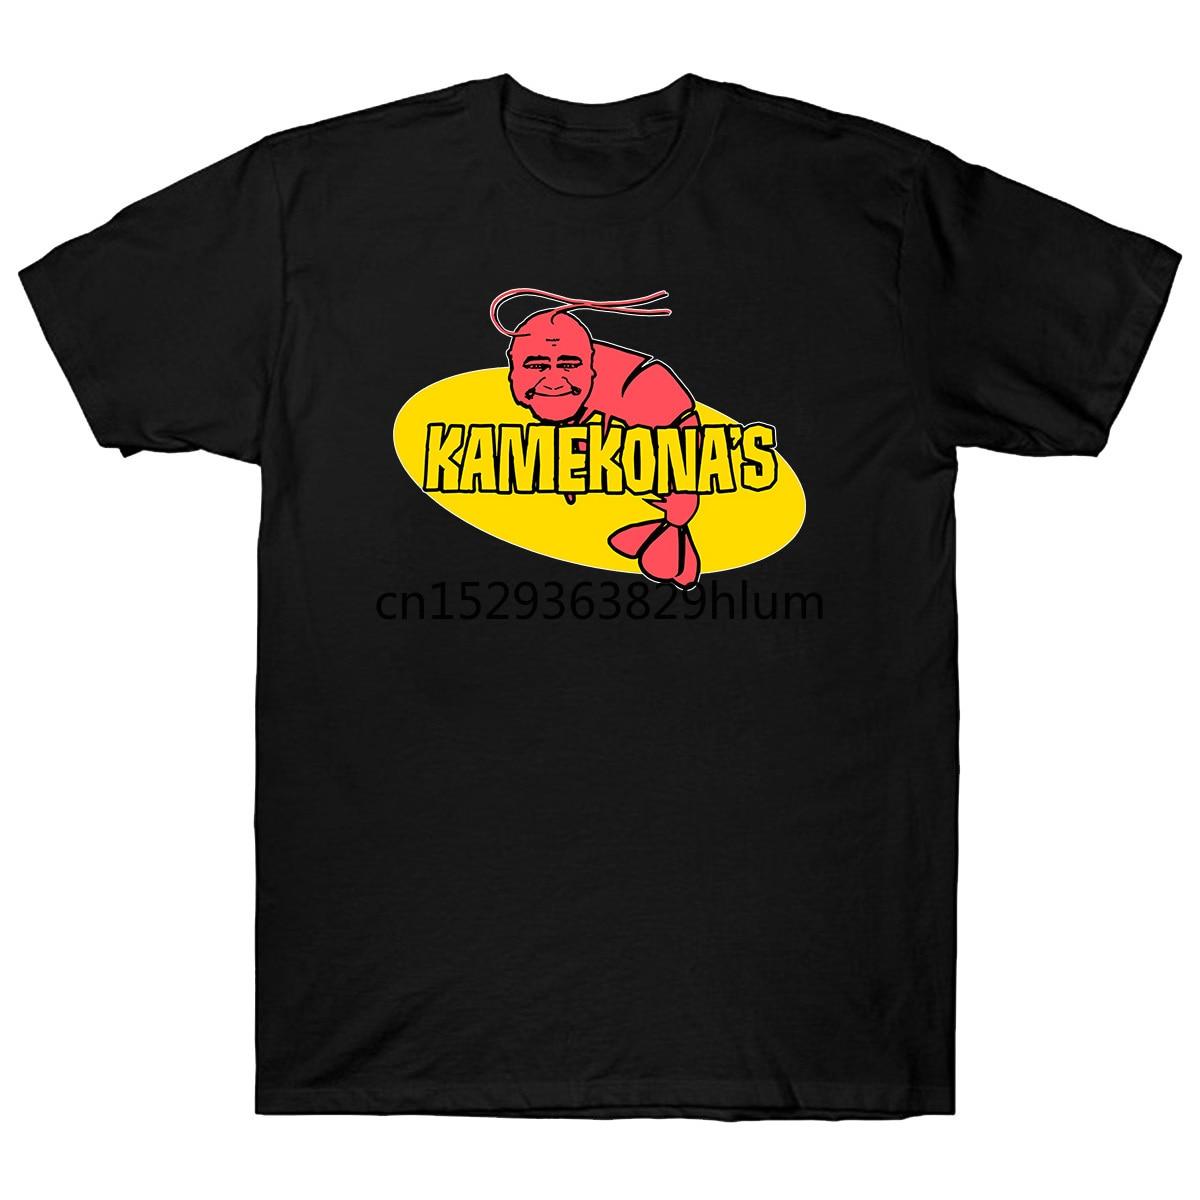 Camiseta de gamba Kamekonas Five 0 Five O Hawaii Five 0 Hawaii Five 0 Hawaii Five O distintivo de policía, libro de playa Em Danno